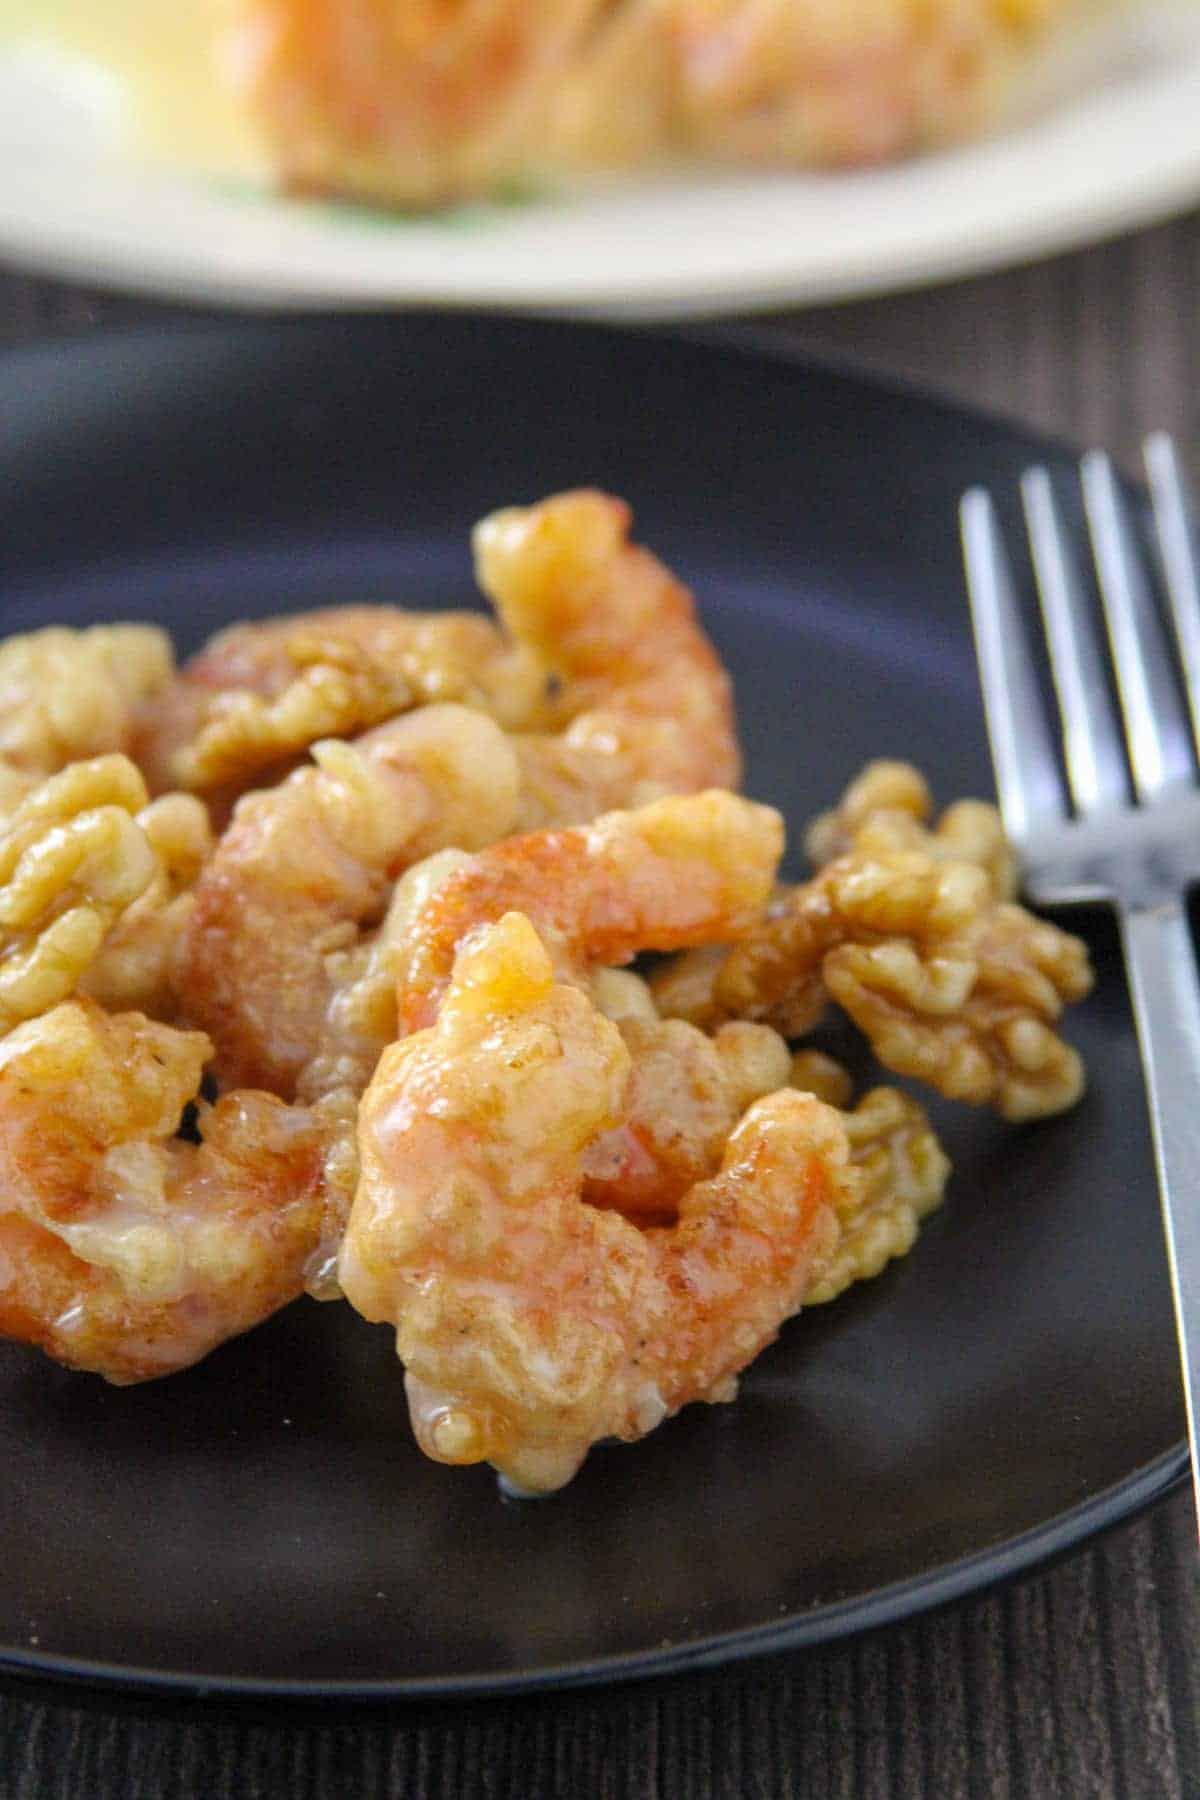 Honey Walnut Shrimp on a black serving plate with a fork